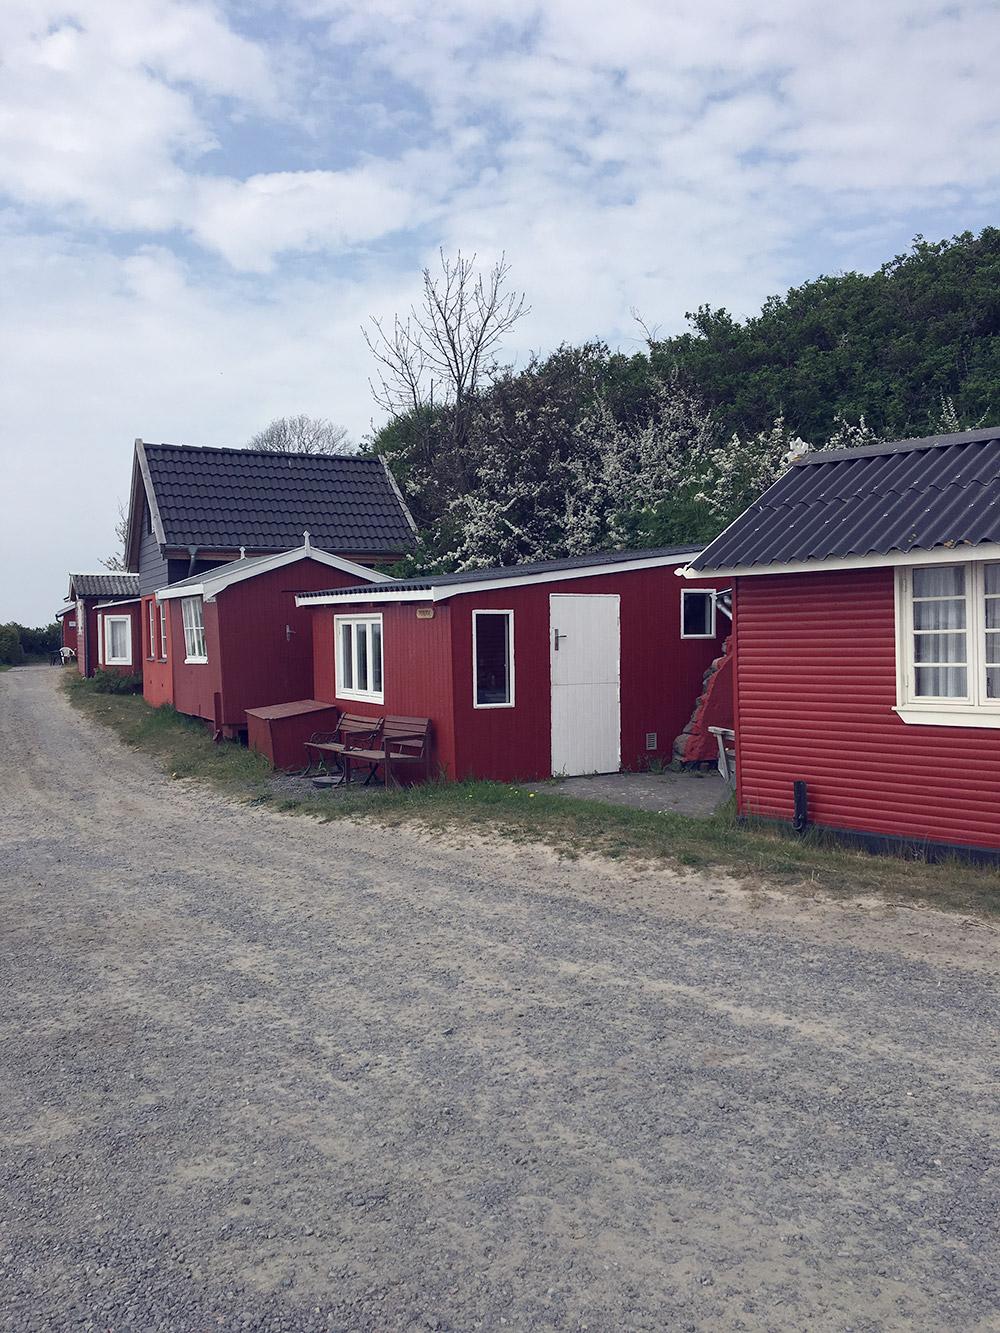 guide små byer bornholm Boderne